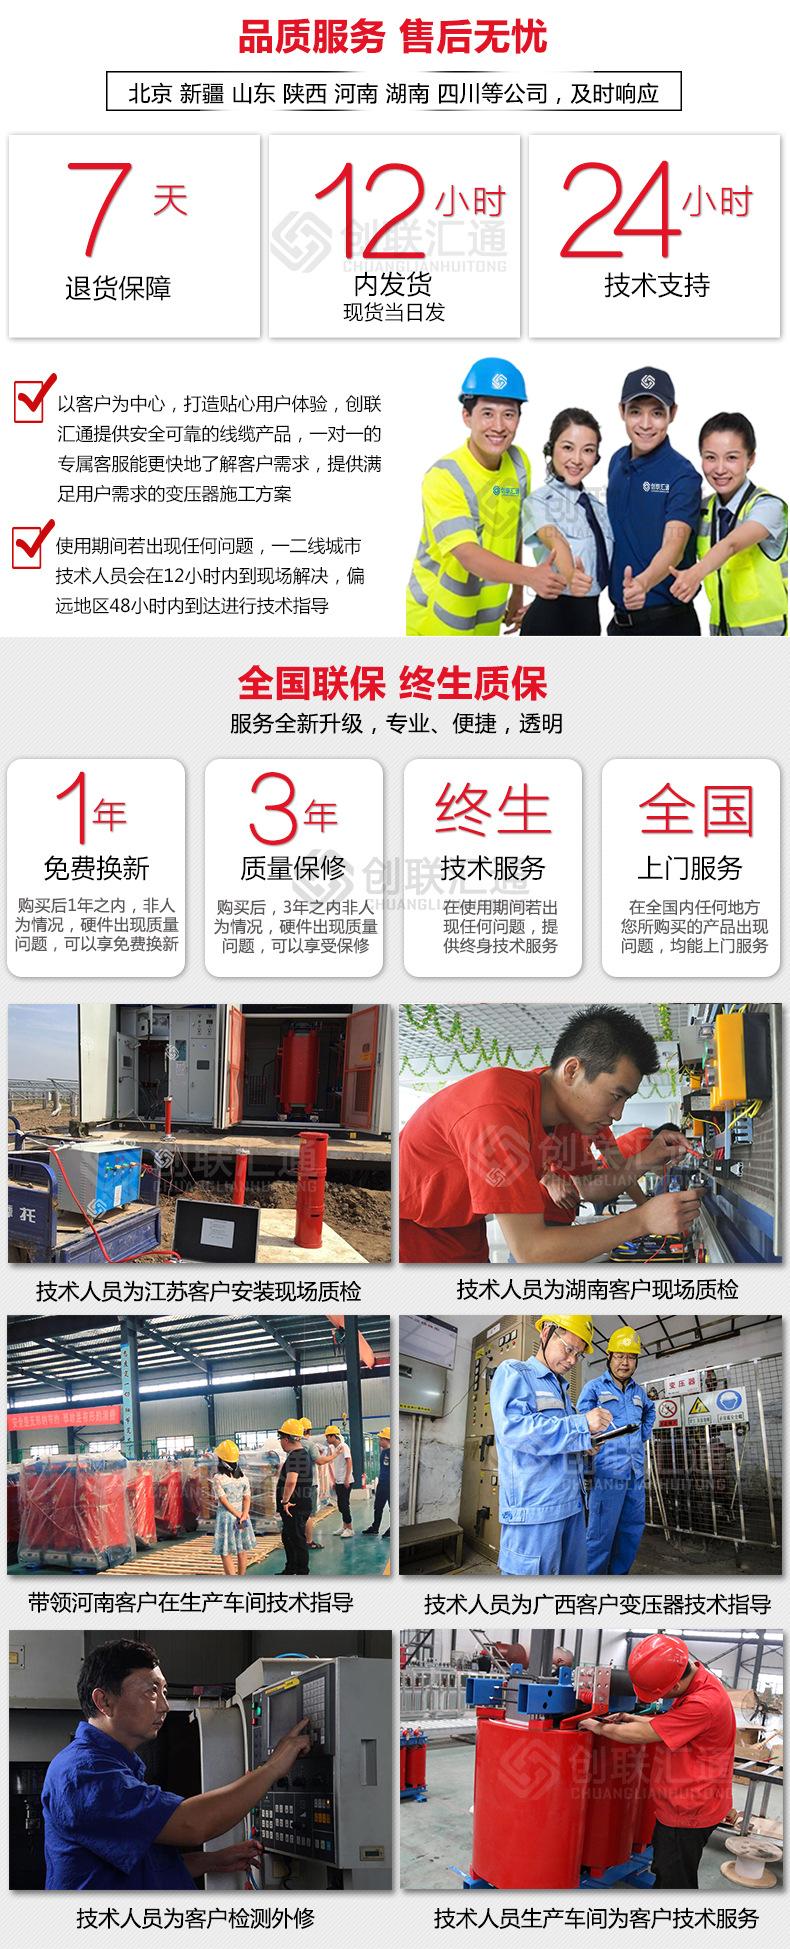 SCBH15-630/10非晶合金干式变压器 630KVA非晶干变 SCBH15非晶变压器-创联汇通示例图18